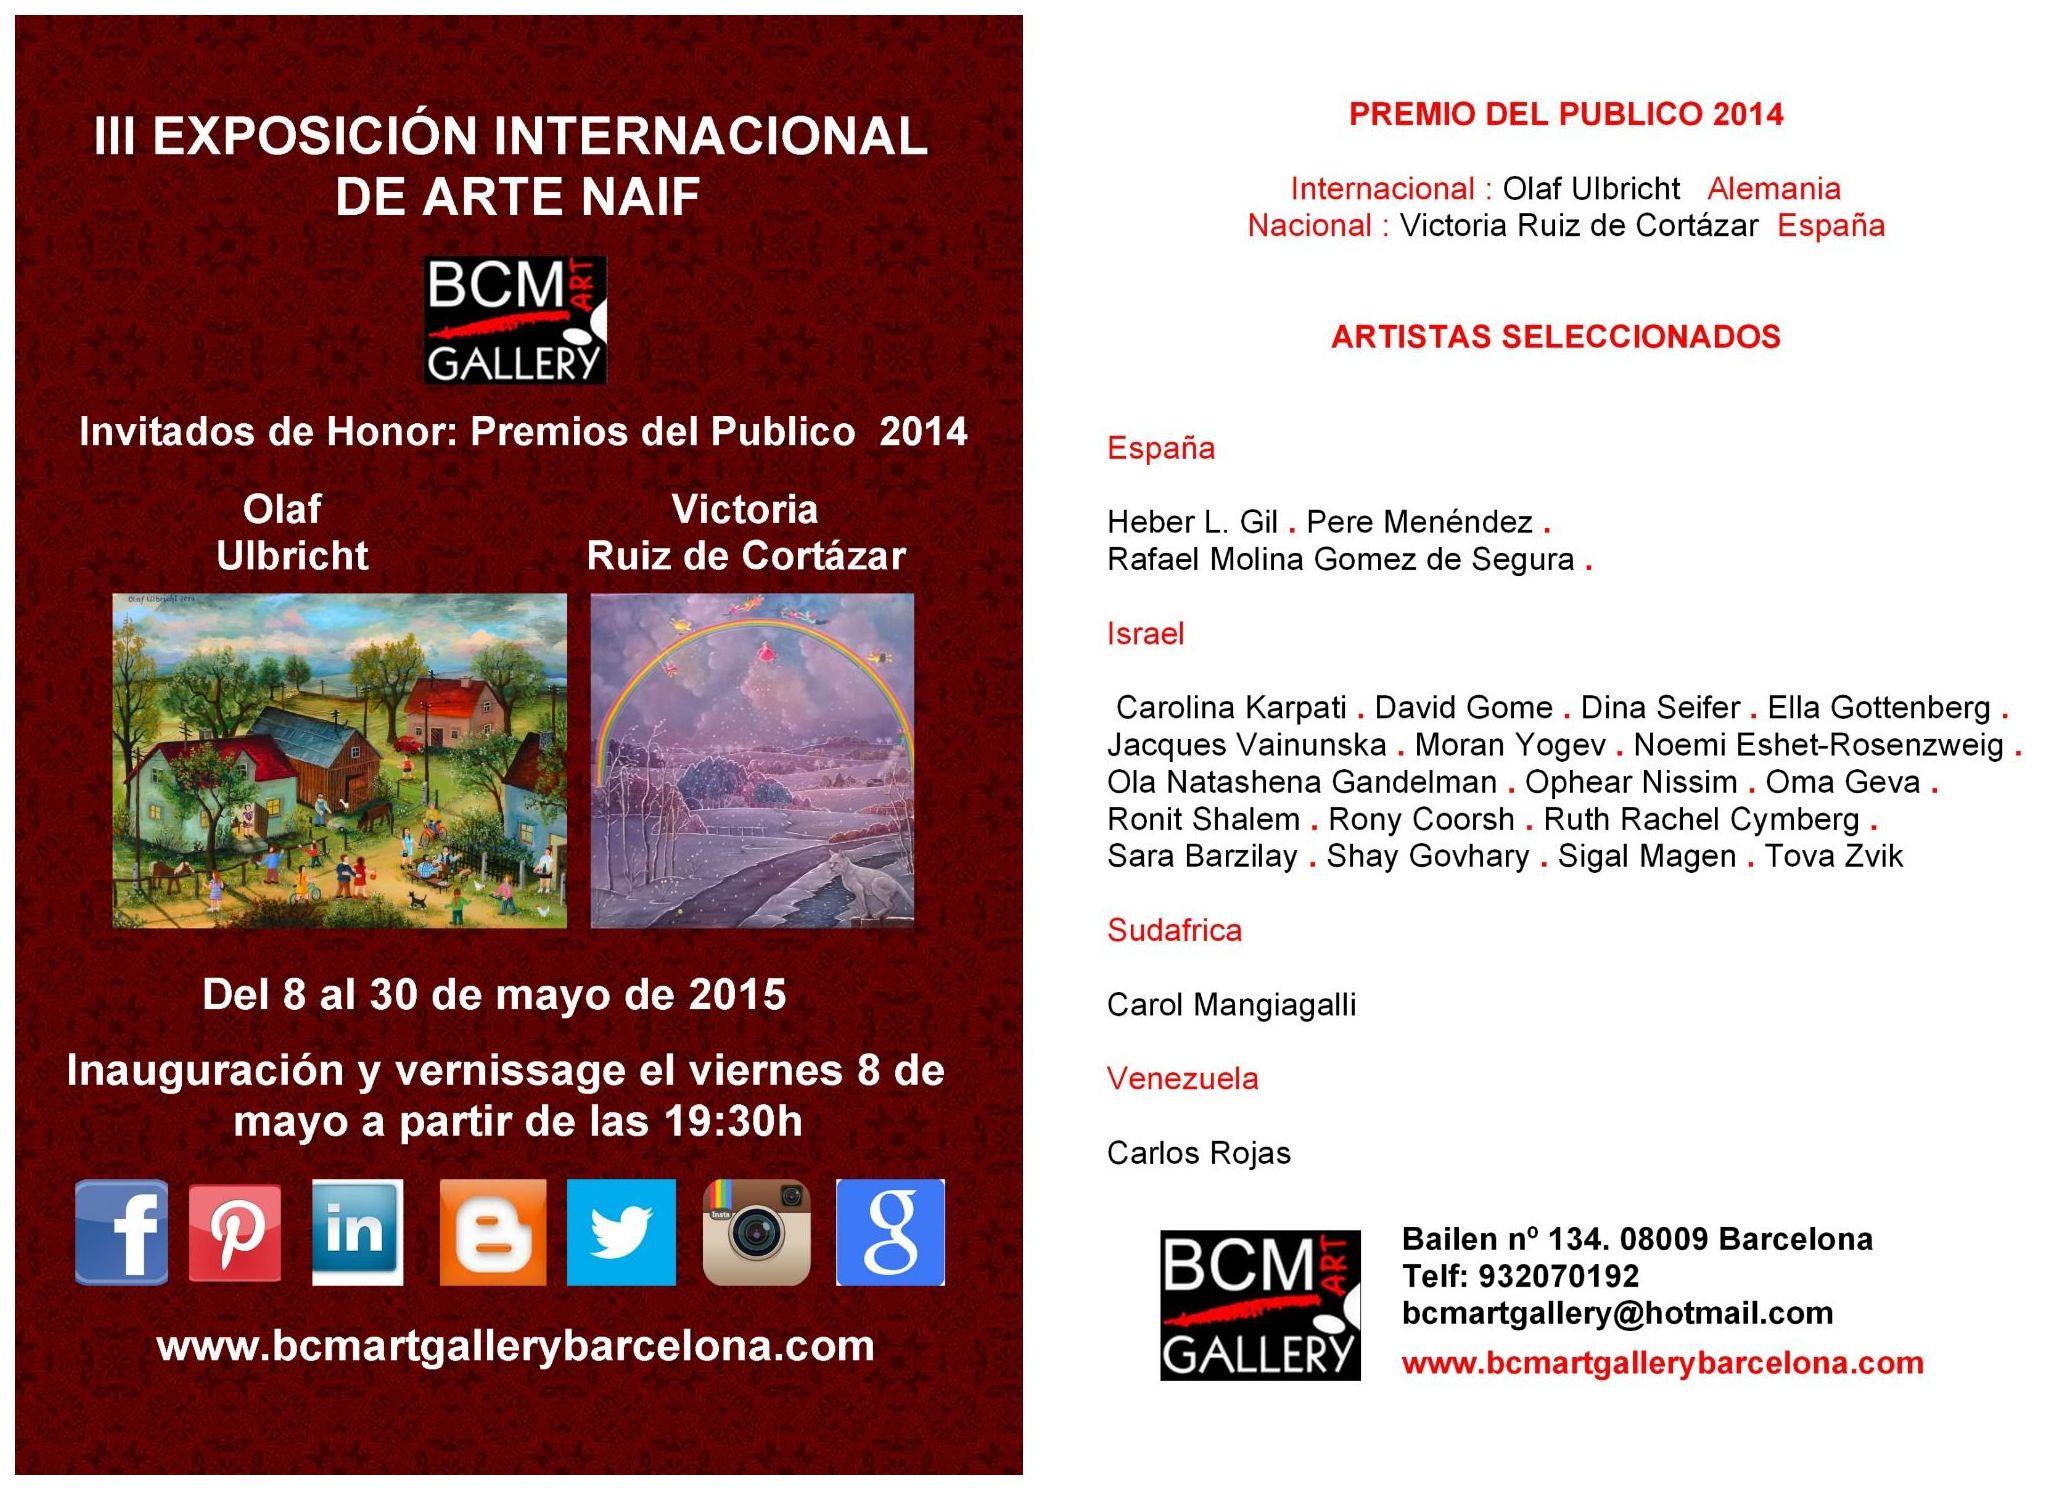 Poster de la III Exposición Internacional de Arte Naif 2